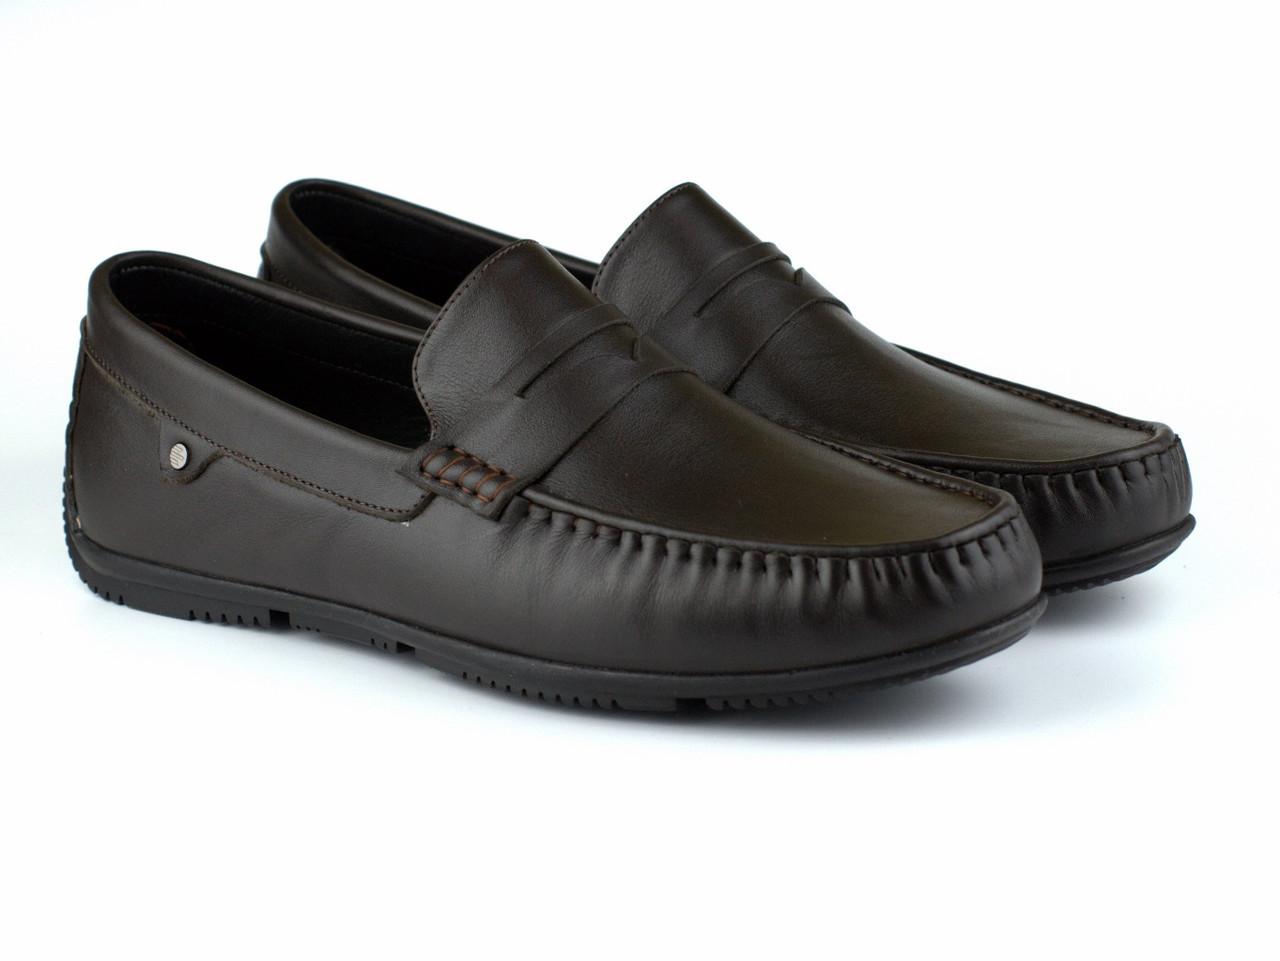 Мокасины кожаные черно-коричневые мужская обувь ETHEREAL Black Brown by Rosso Avangard